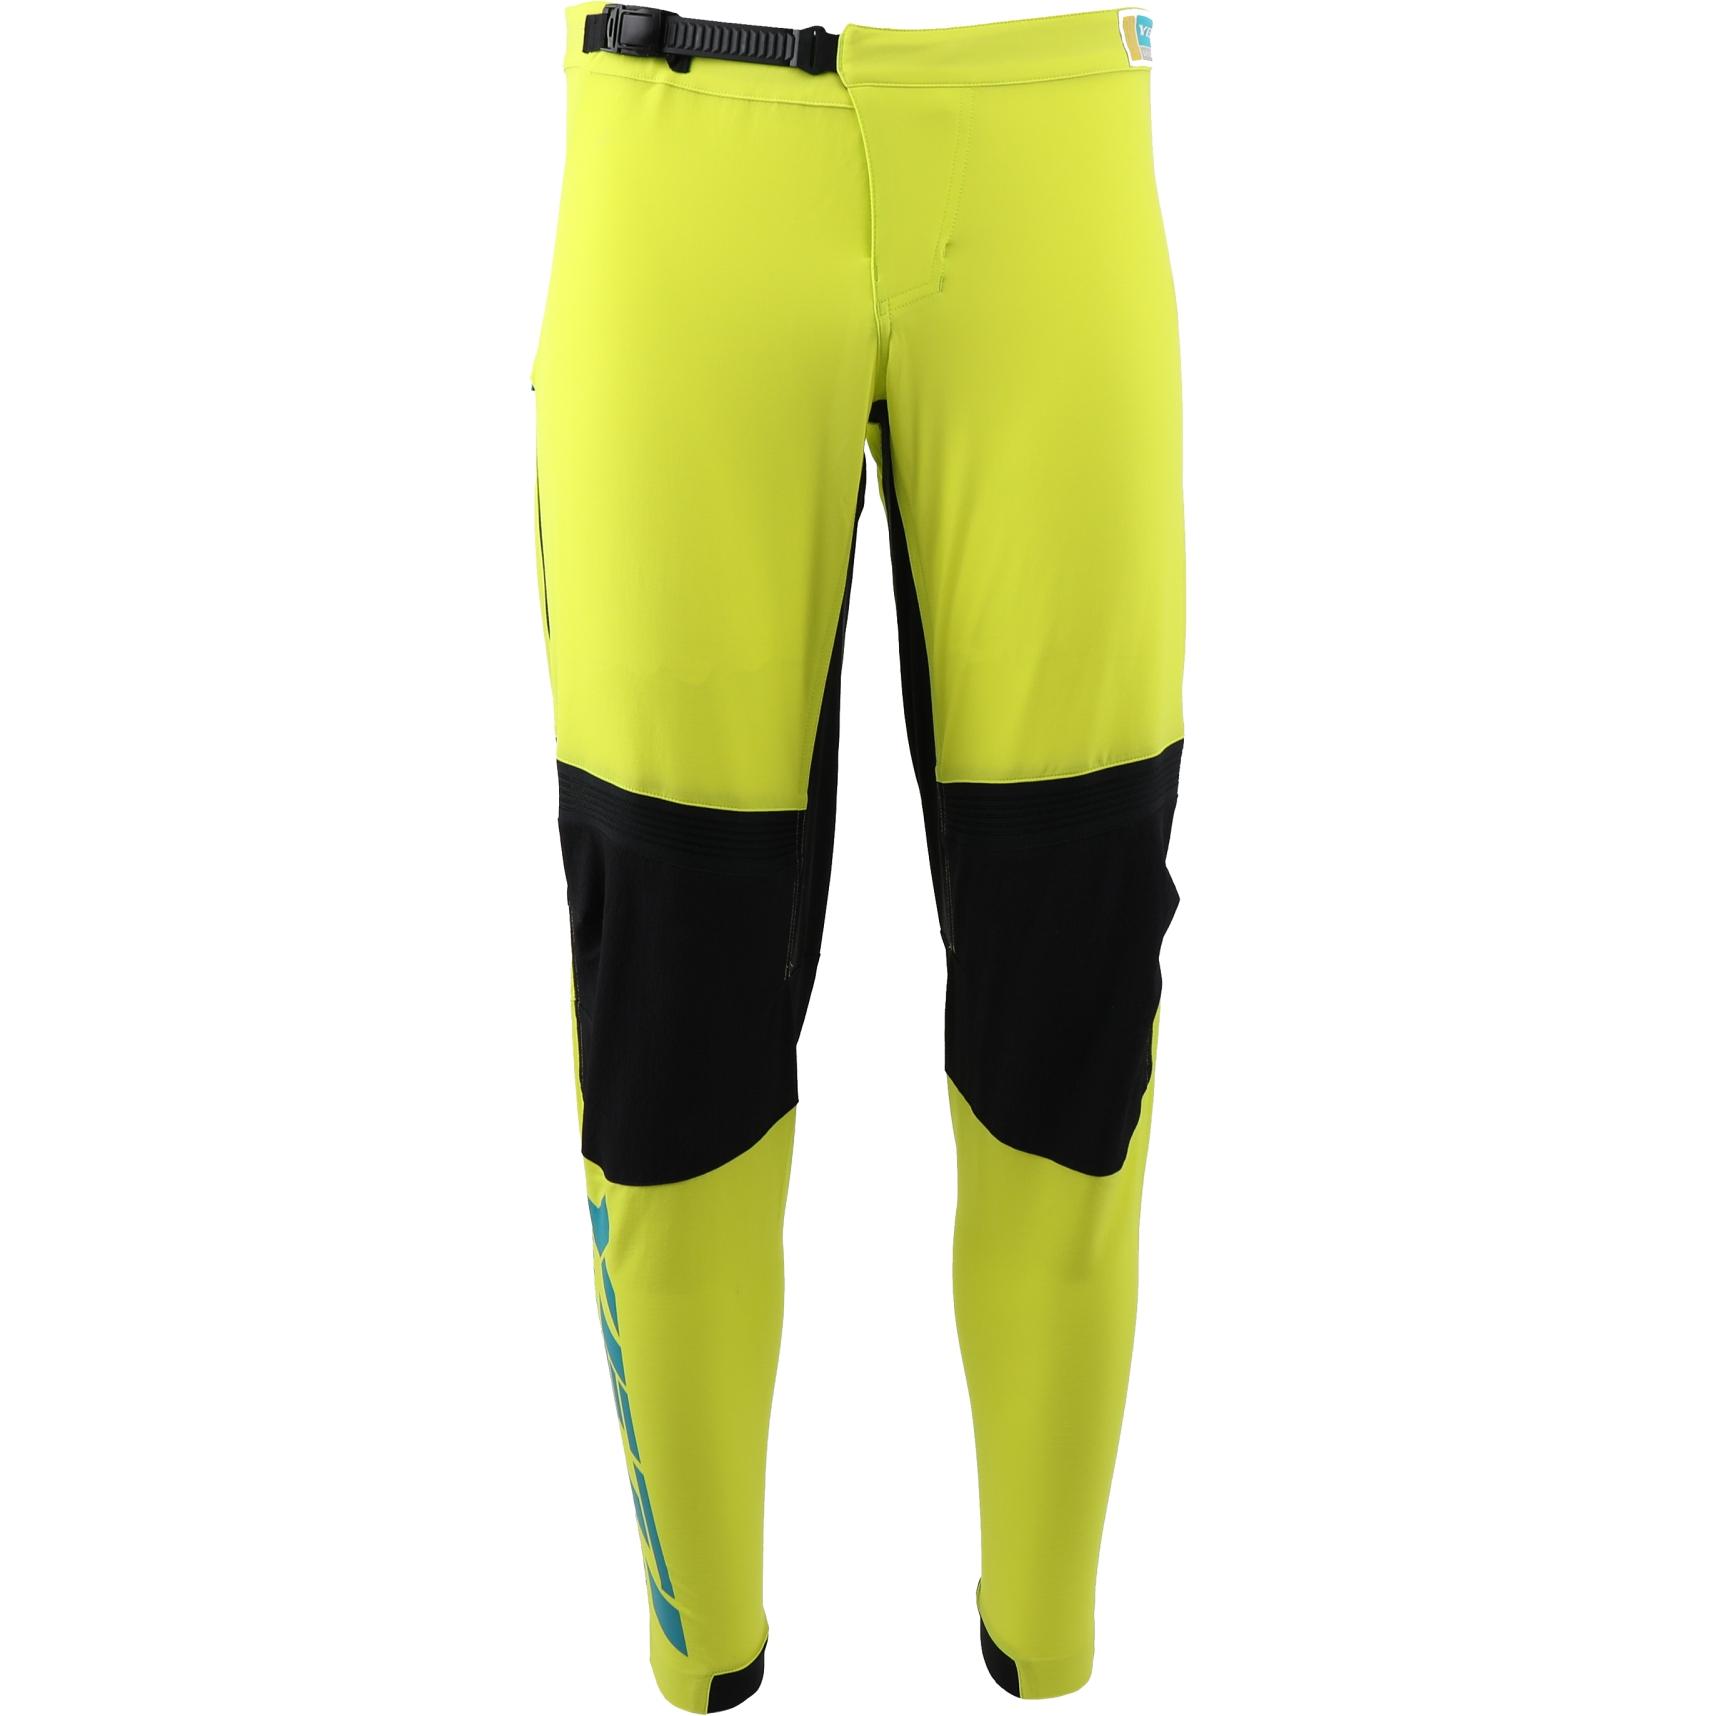 Yeti Cycles Renegade Ride Pants - Lime